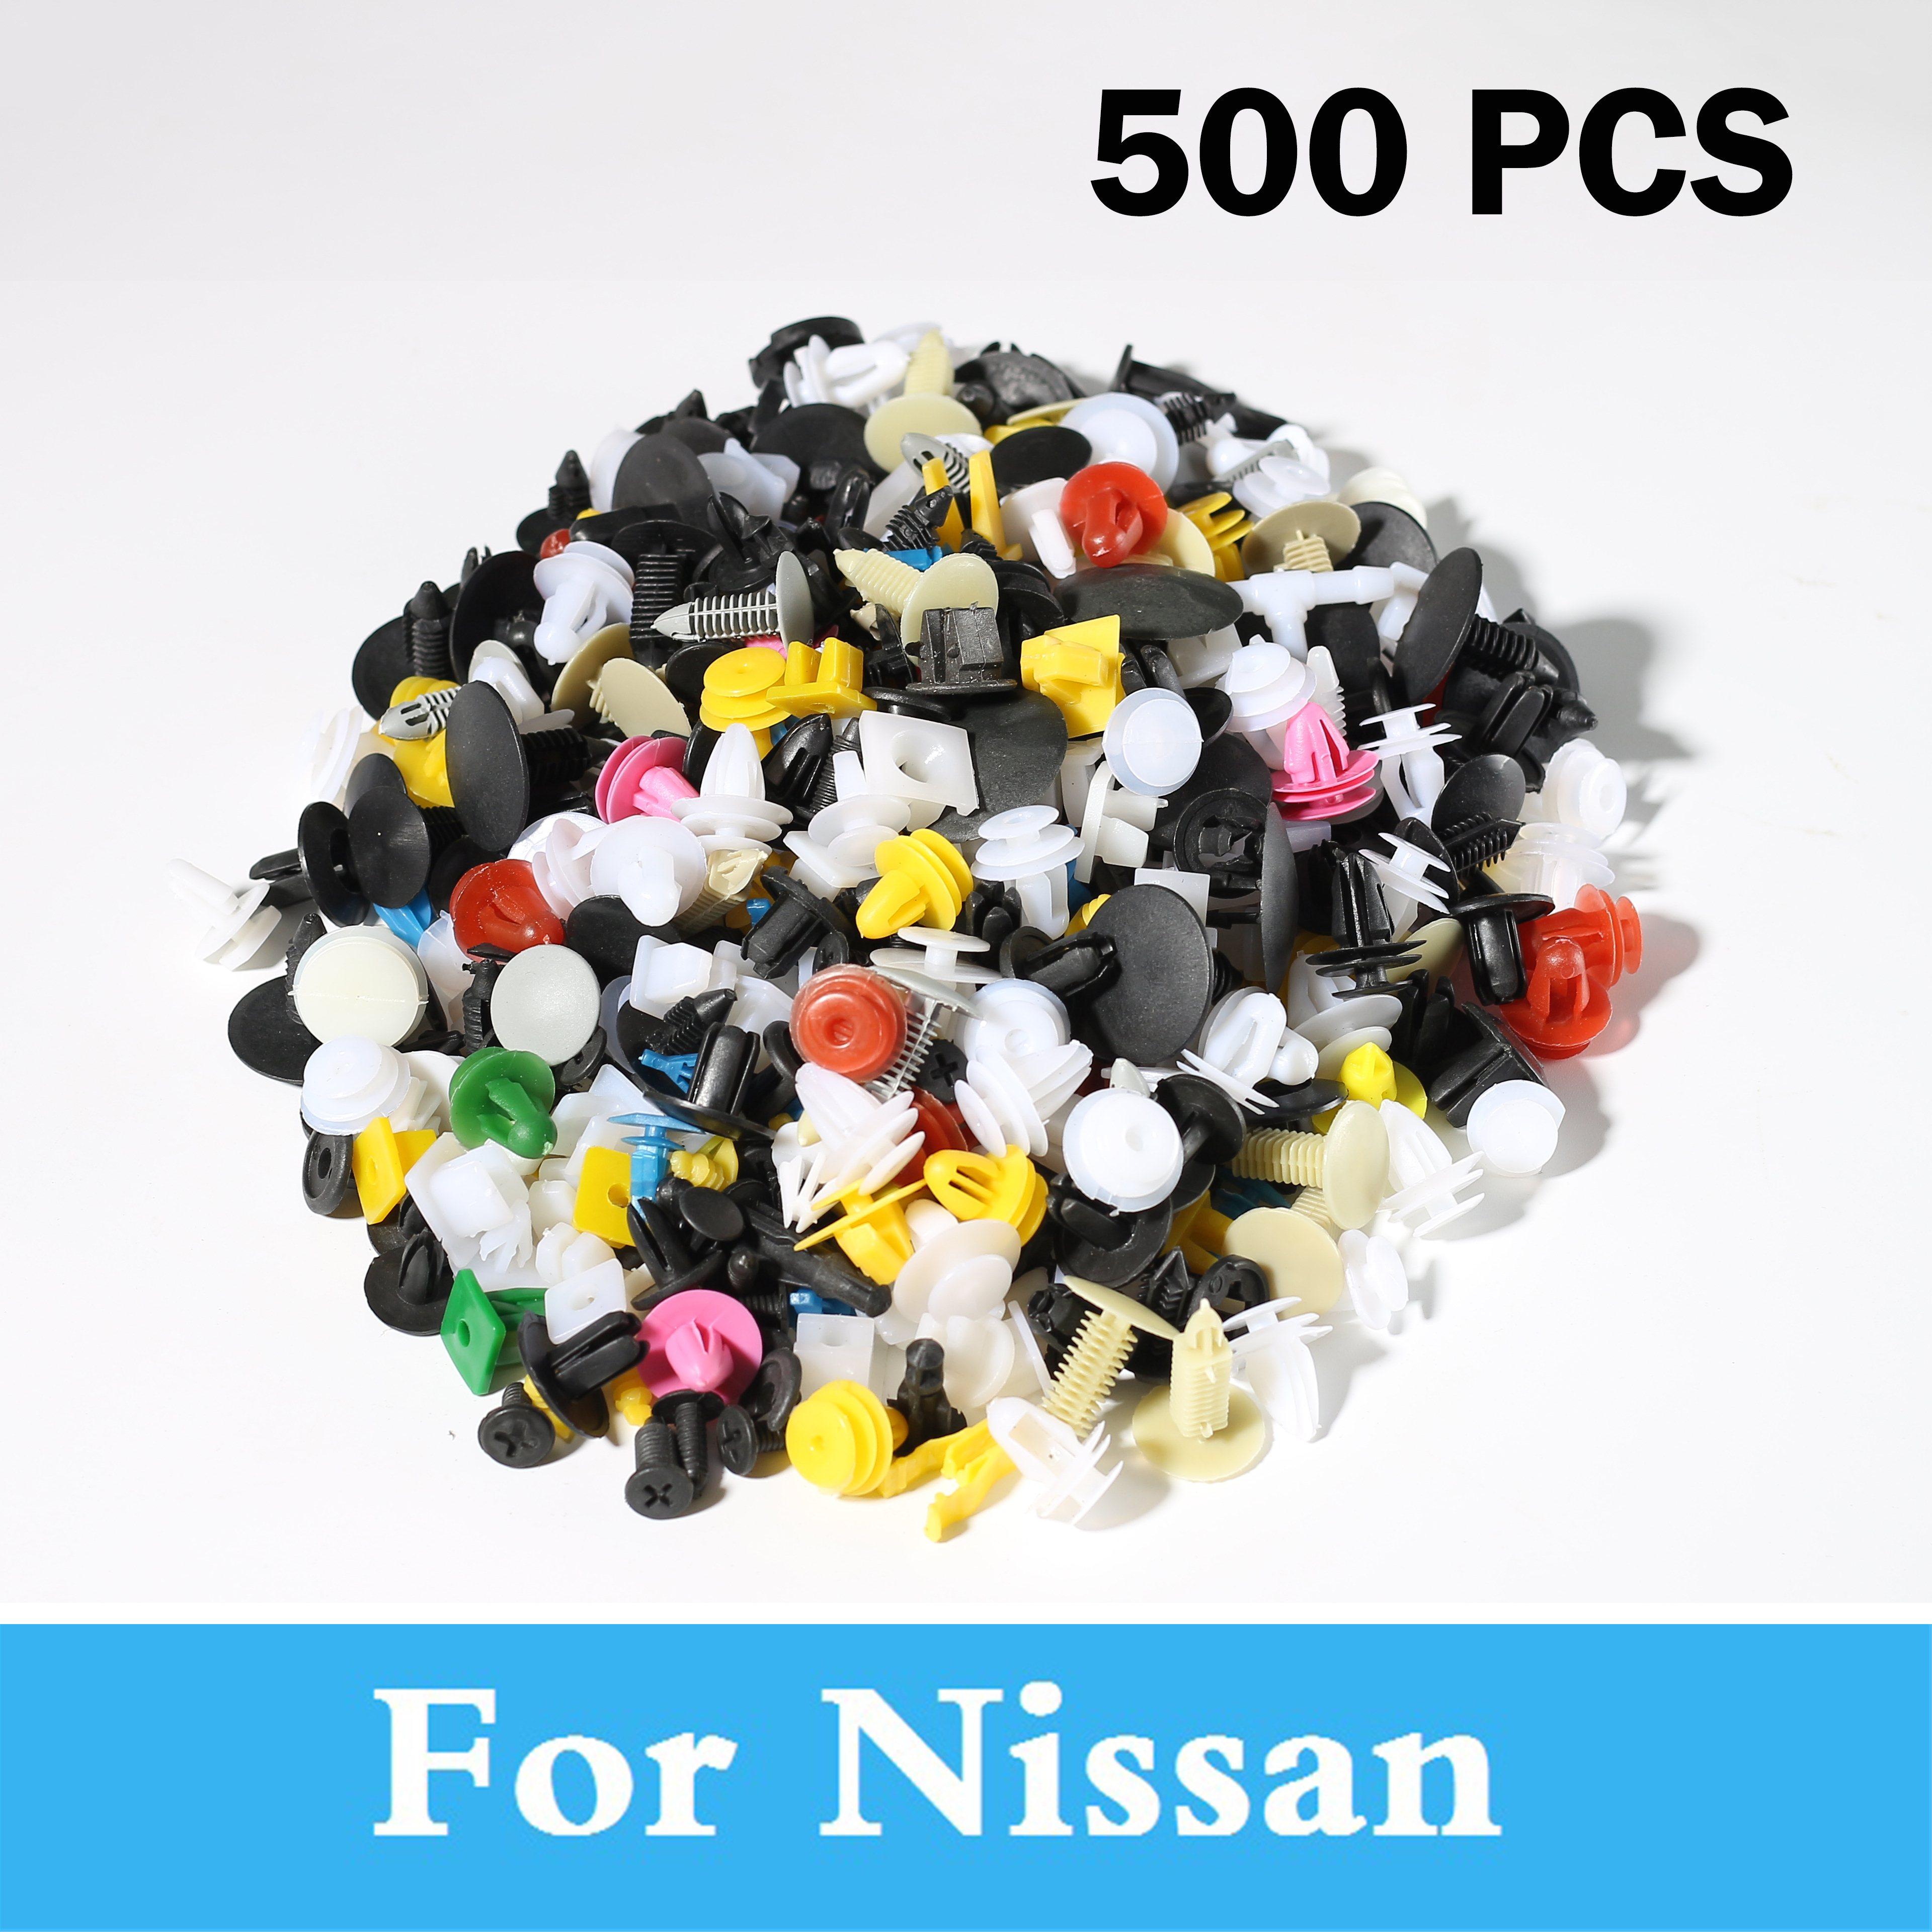 New 500pcs Car Plastic Rivets Fastener Bumper Trim Clips For Nissan Altima Armada Avenir Ad Almera Classic Juke Nismo 350z 370z